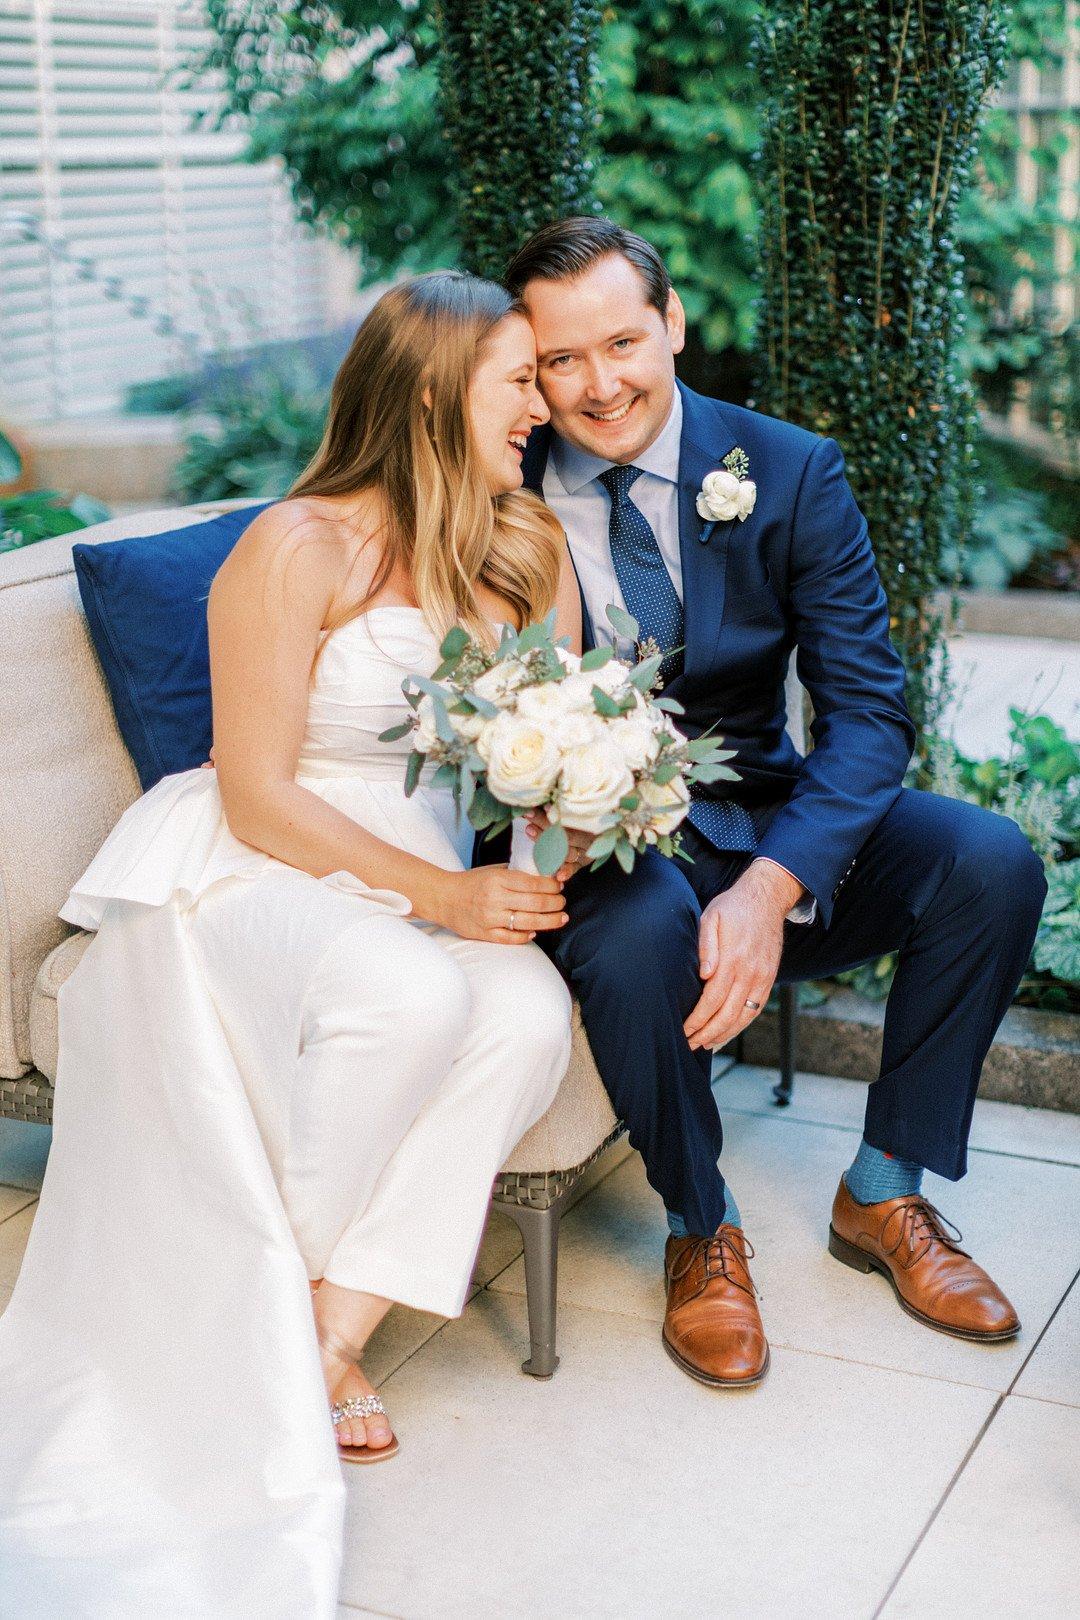 social-distance-wrist-bands-at-wedding